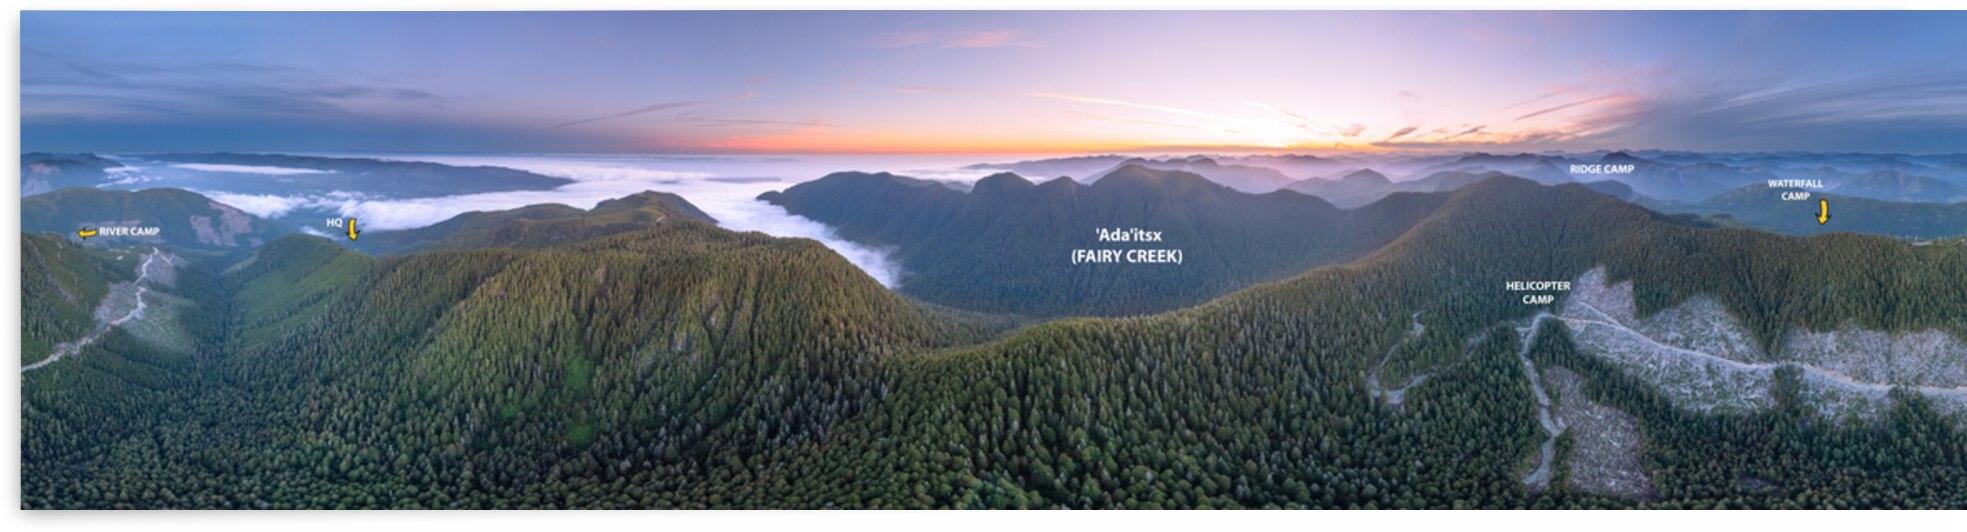 Fairy Creek Panorama by Arvin Singh Uzunov Dang